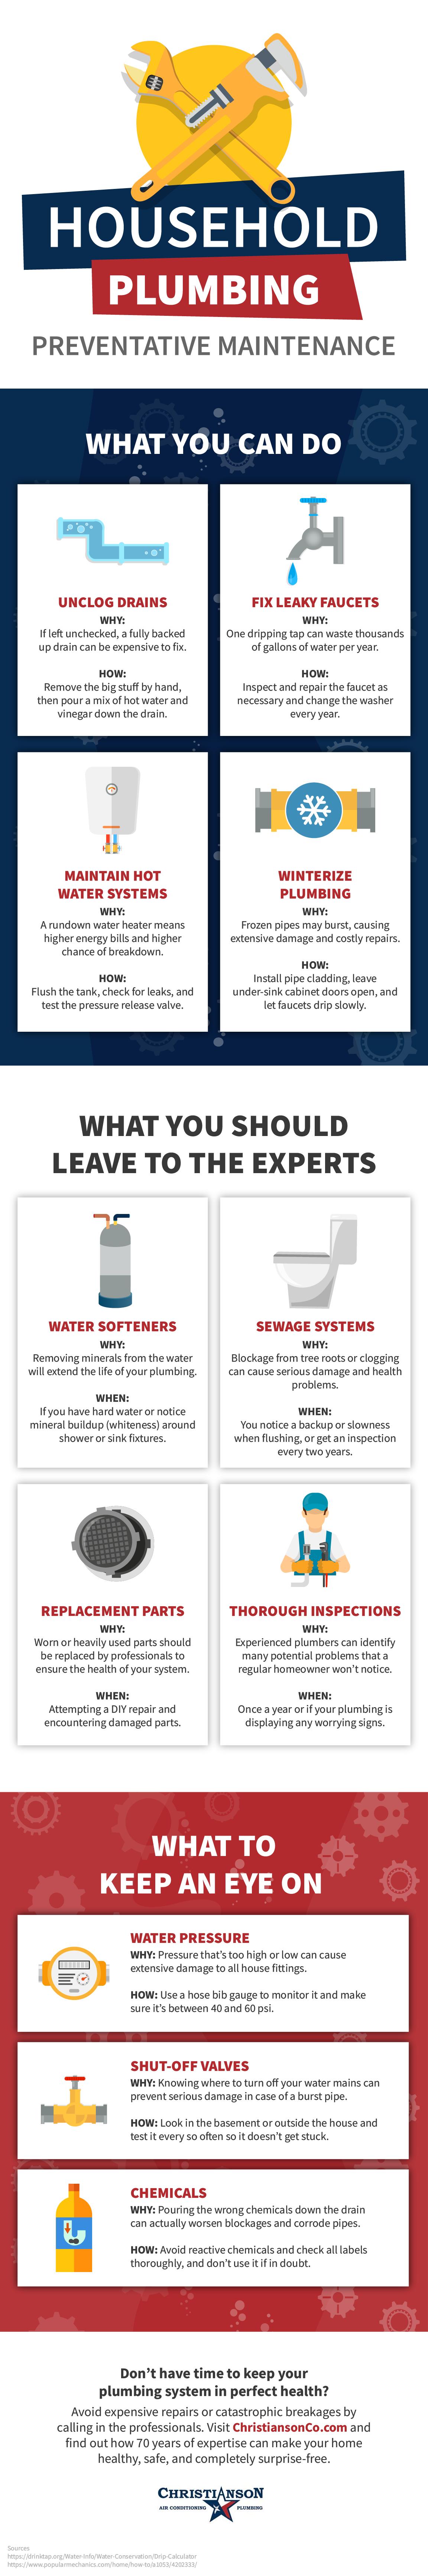 Household Plumbing Preventative Maintenance Infographic